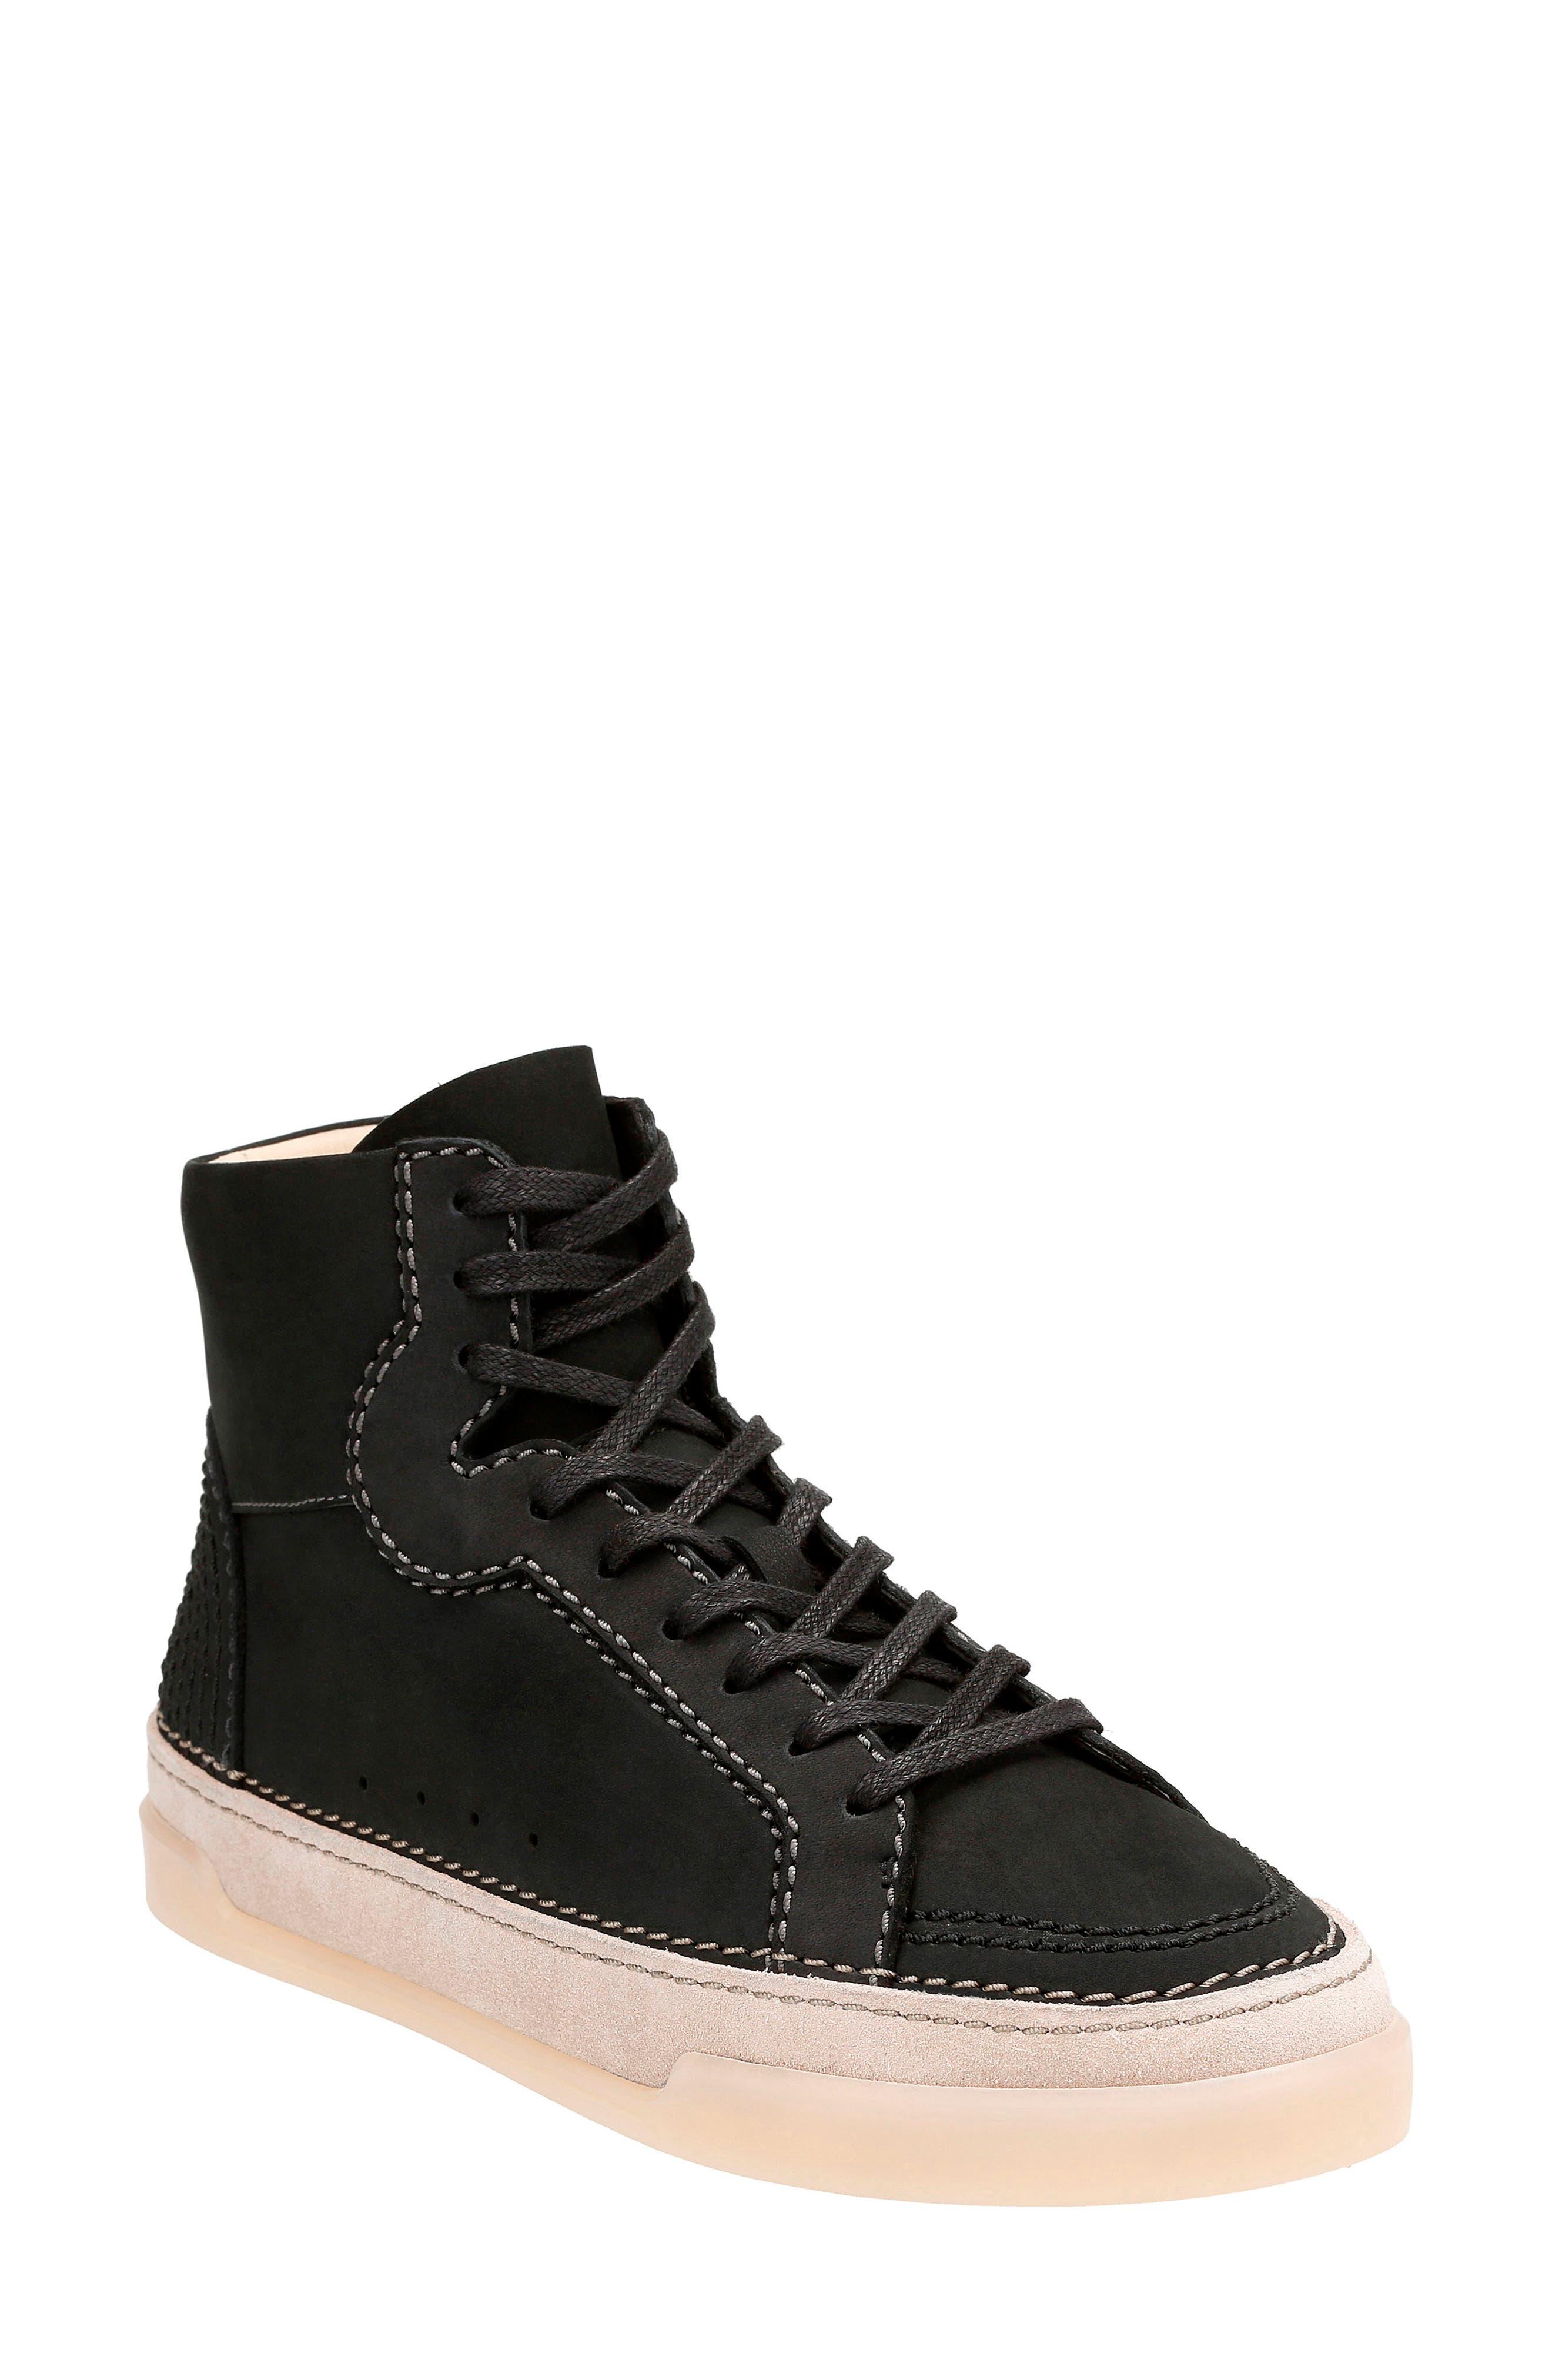 Hidi Haze High Top Sneaker,                         Main,                         color,